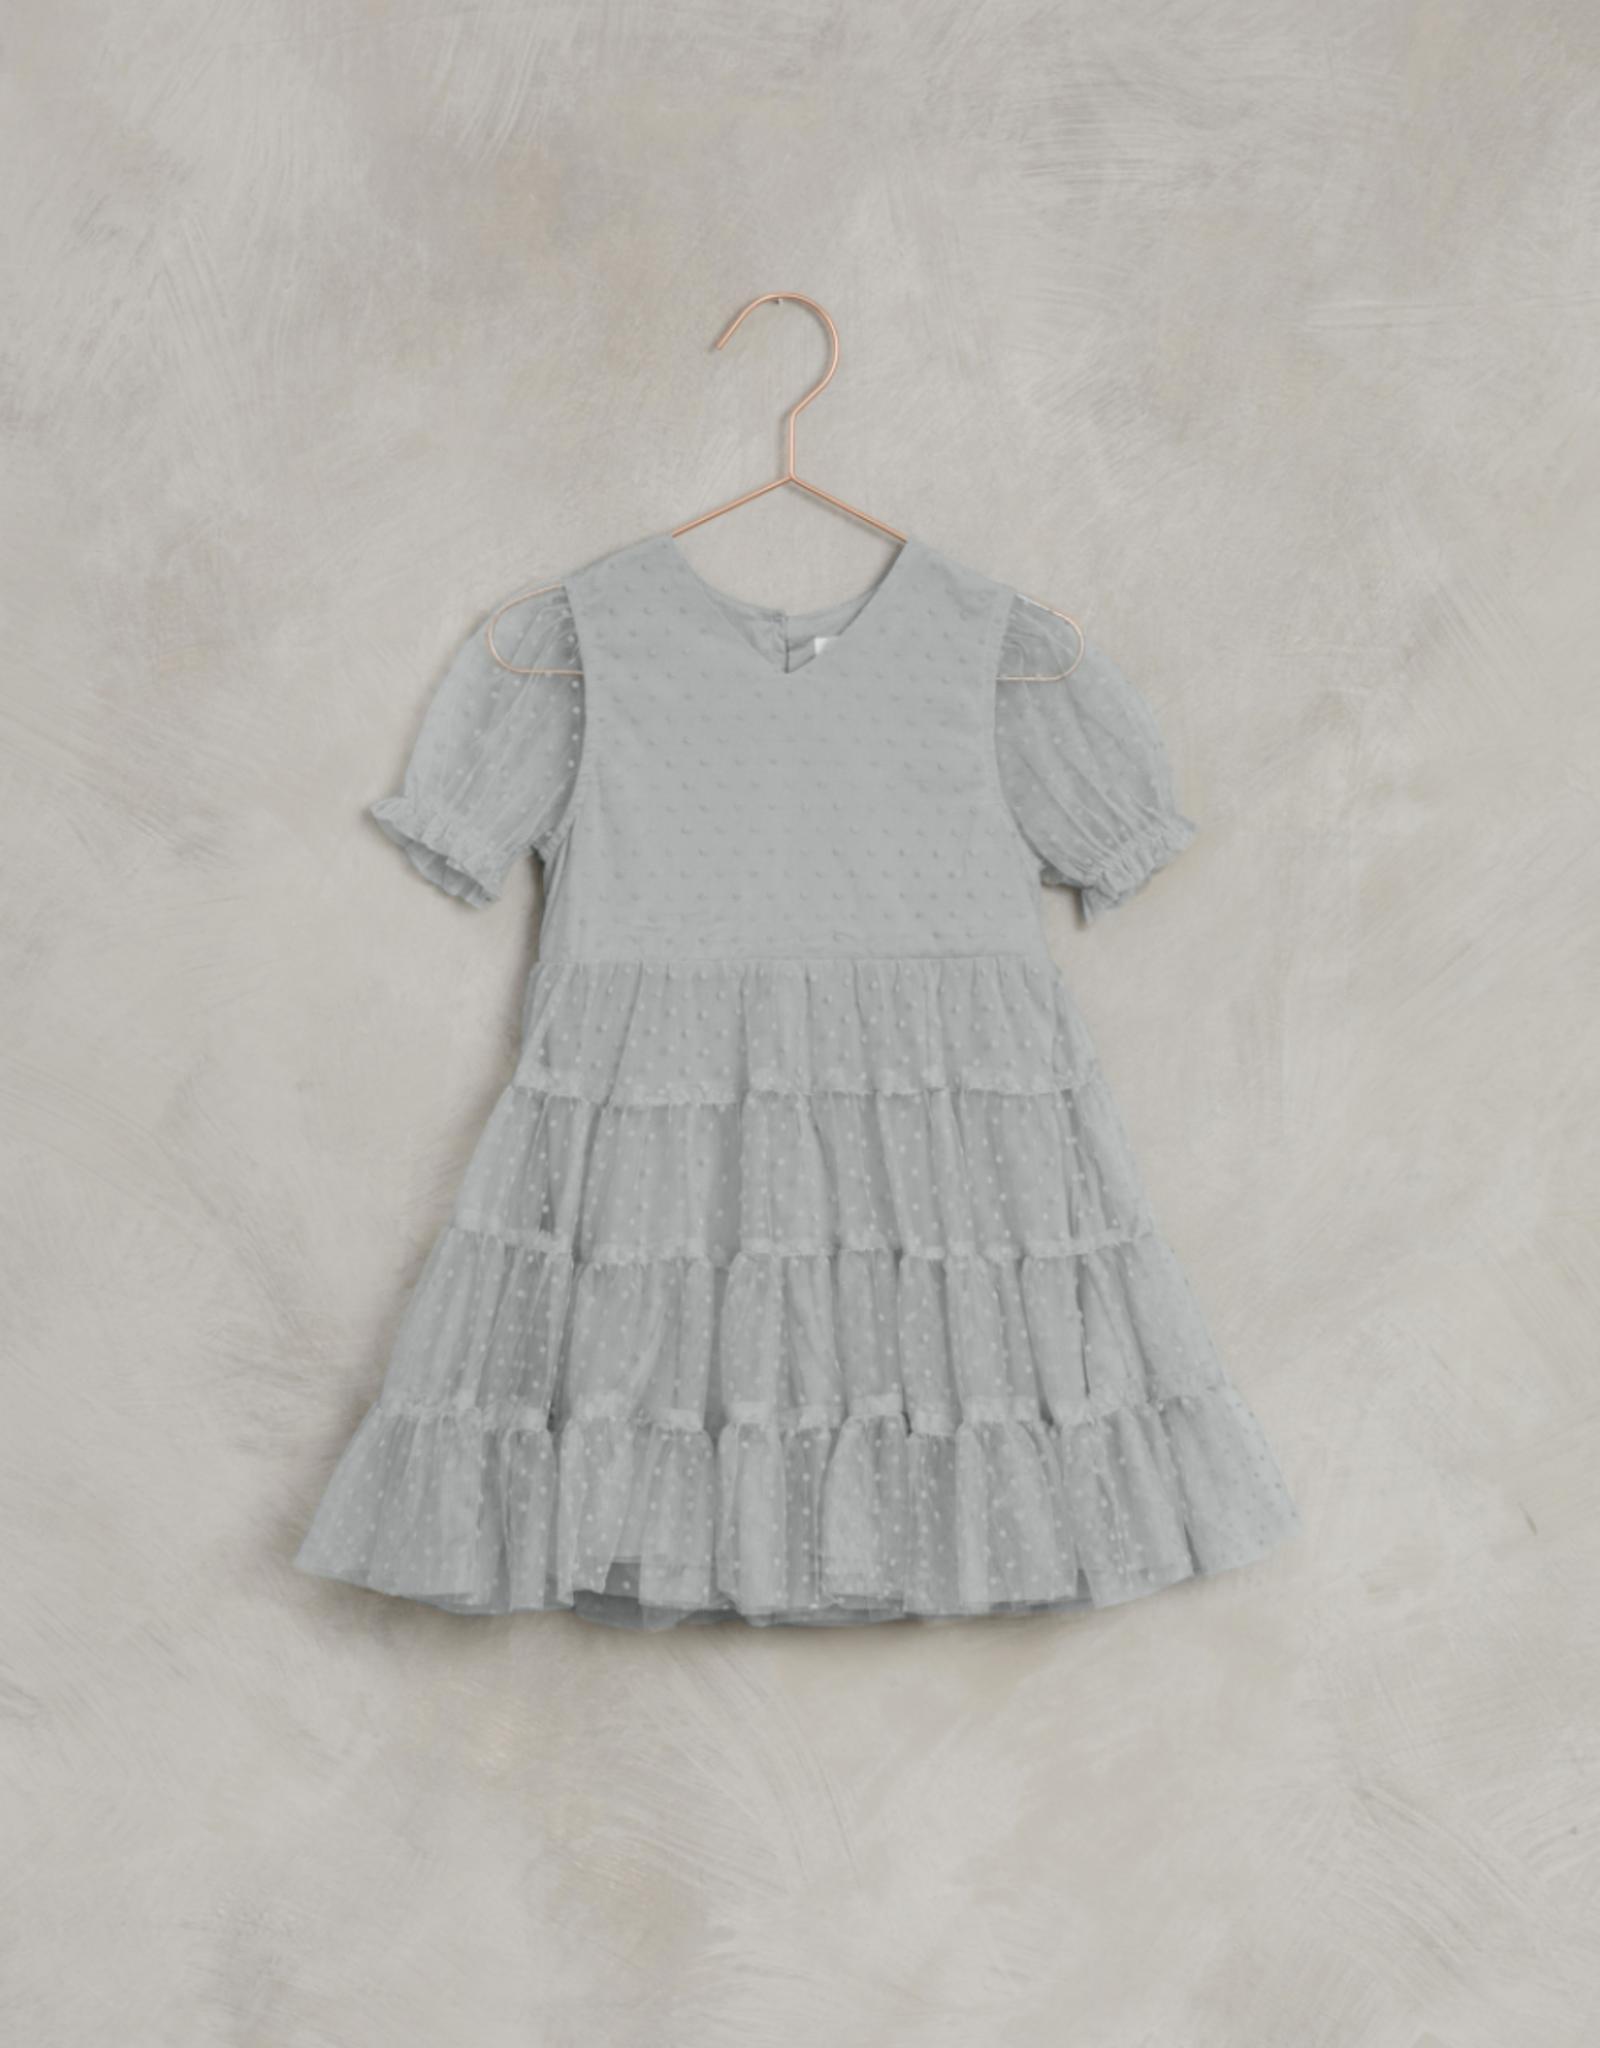 Noralee Noralee Dottie Dress